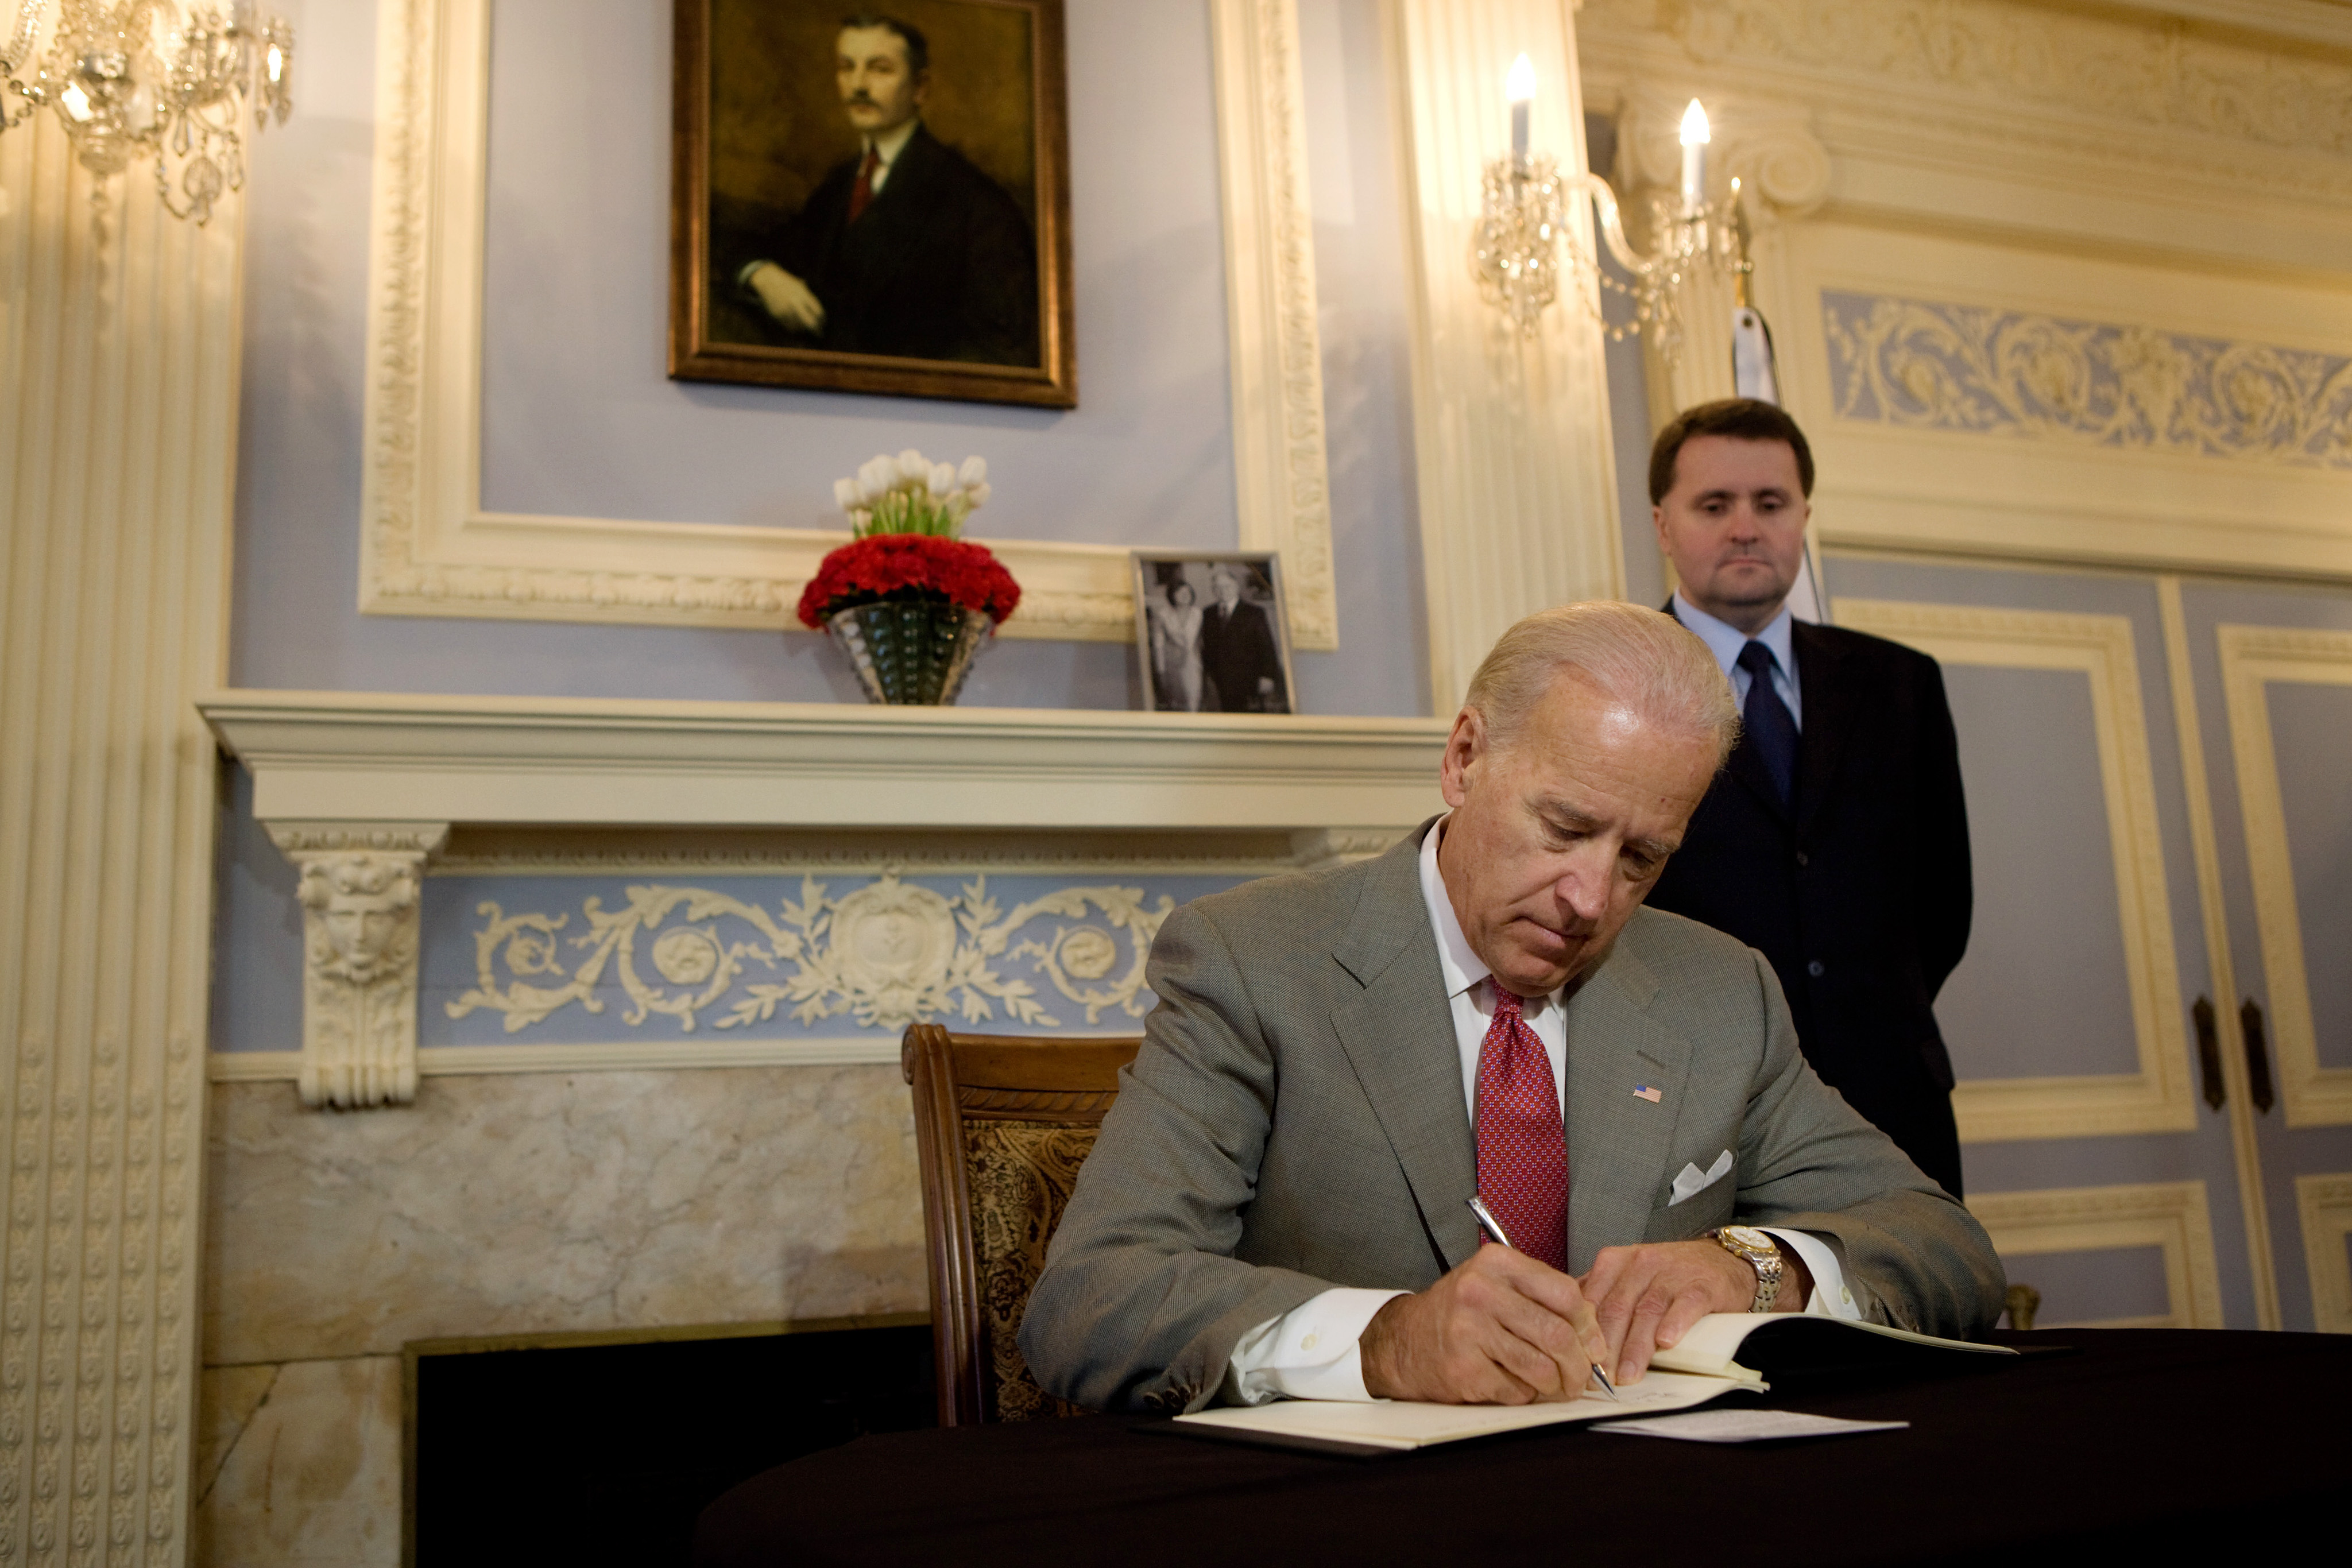 https://upload.wikimedia.org/wikipedia/commons/c/c6/Vice_President_Joe_Biden_writing_condolence_message_at_Polish_Embassy_in_Washington.jpg